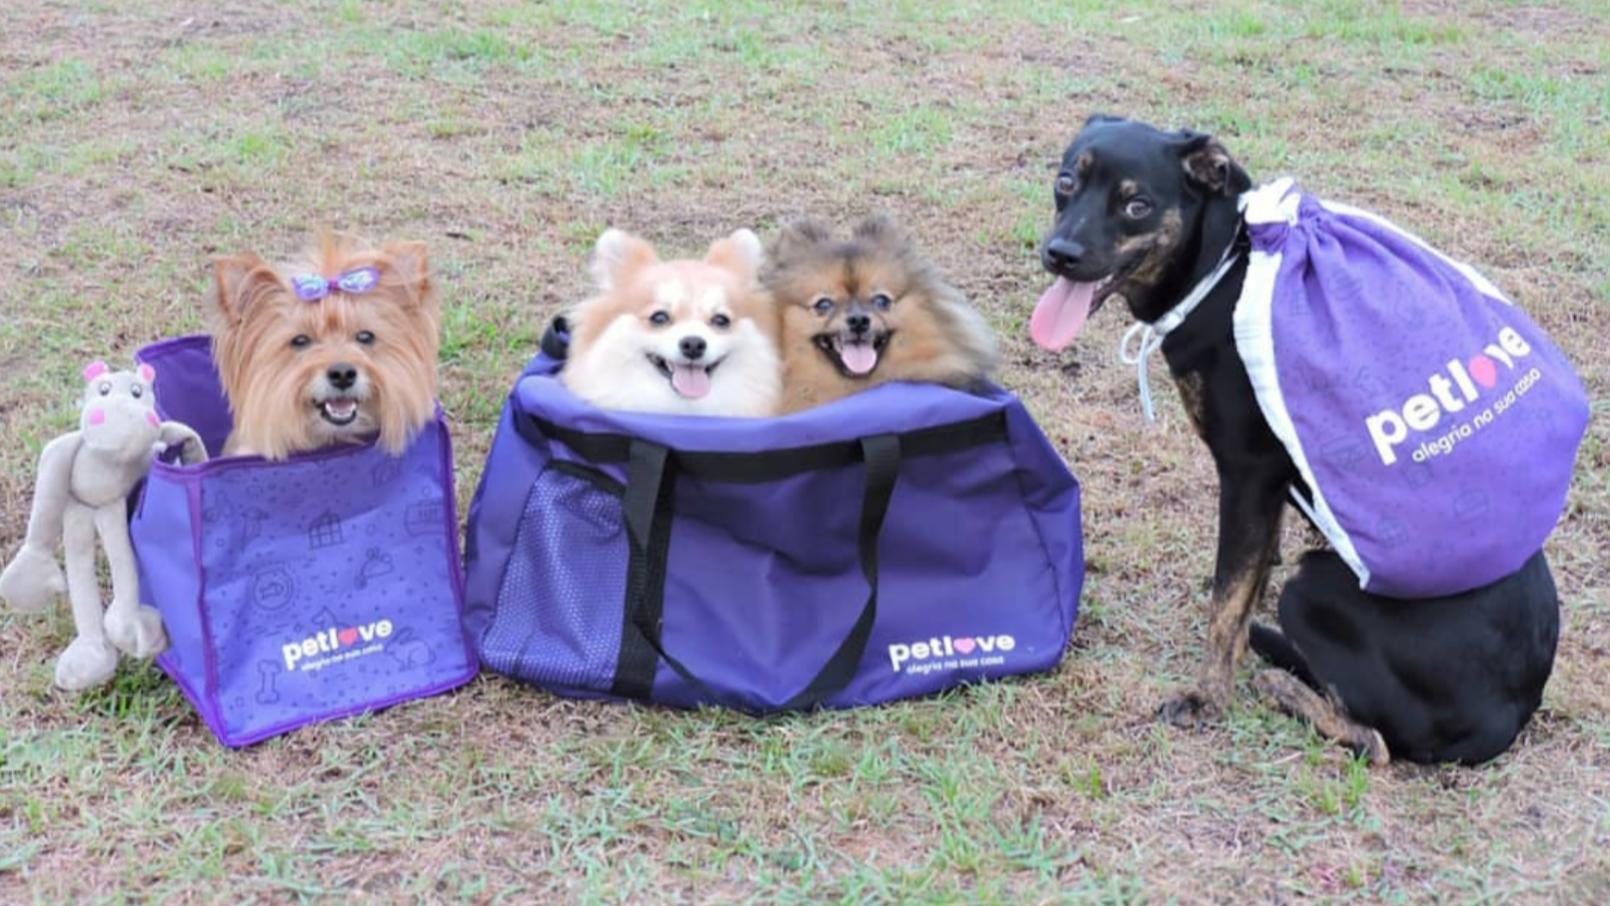 case-petlove-cachorros-creditos-@sweetthree_